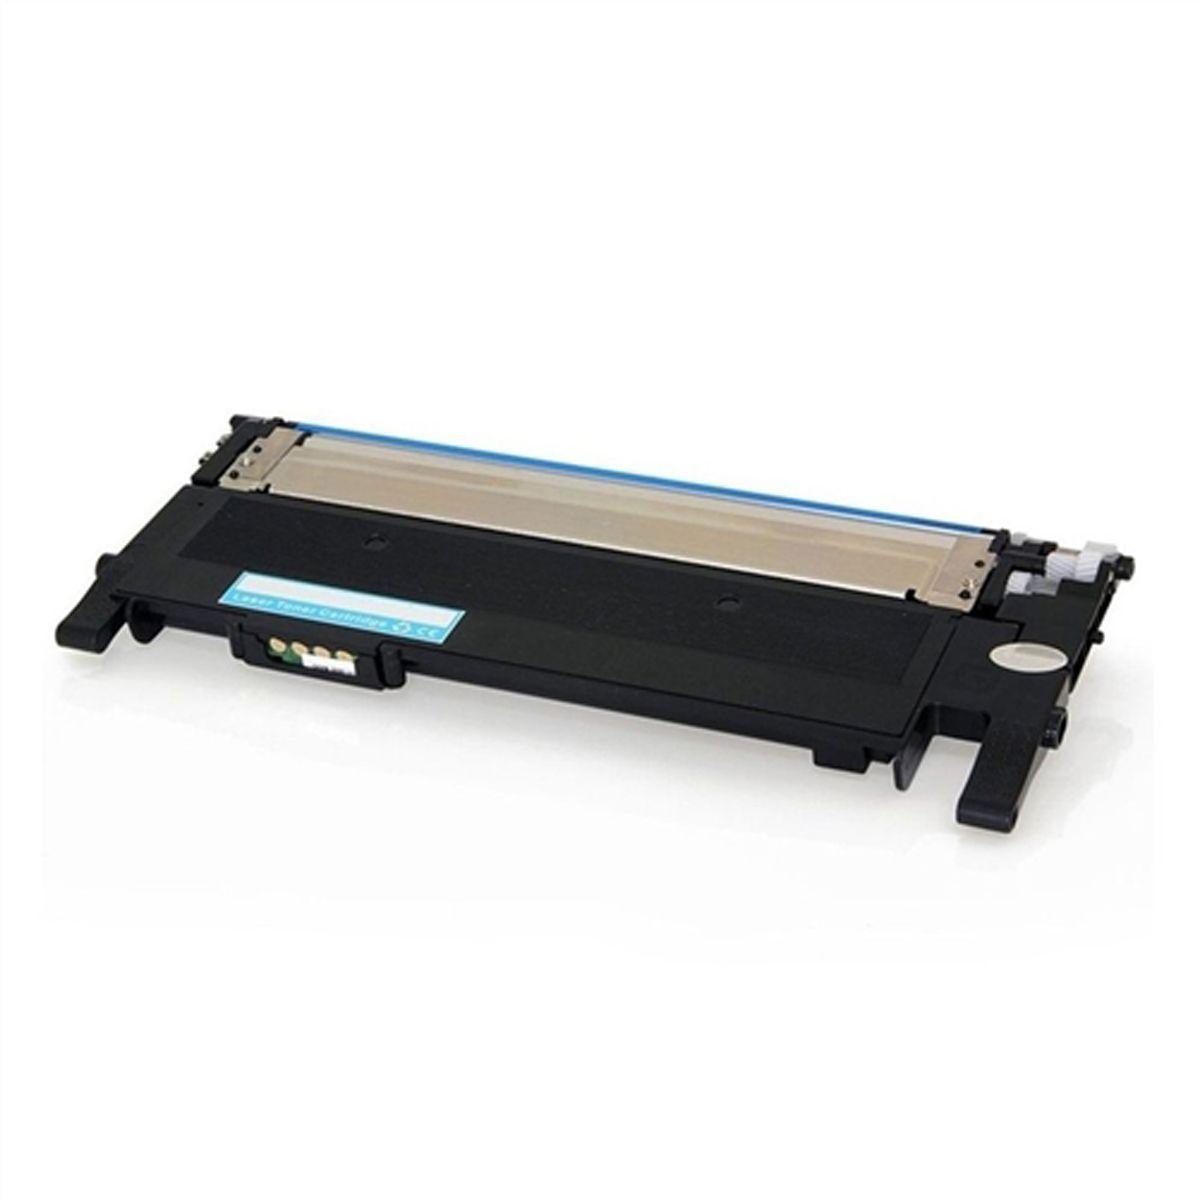 Toner Samsung CLT-C404S Ciano - C430 C480 C430W C480W C480FW Compativel